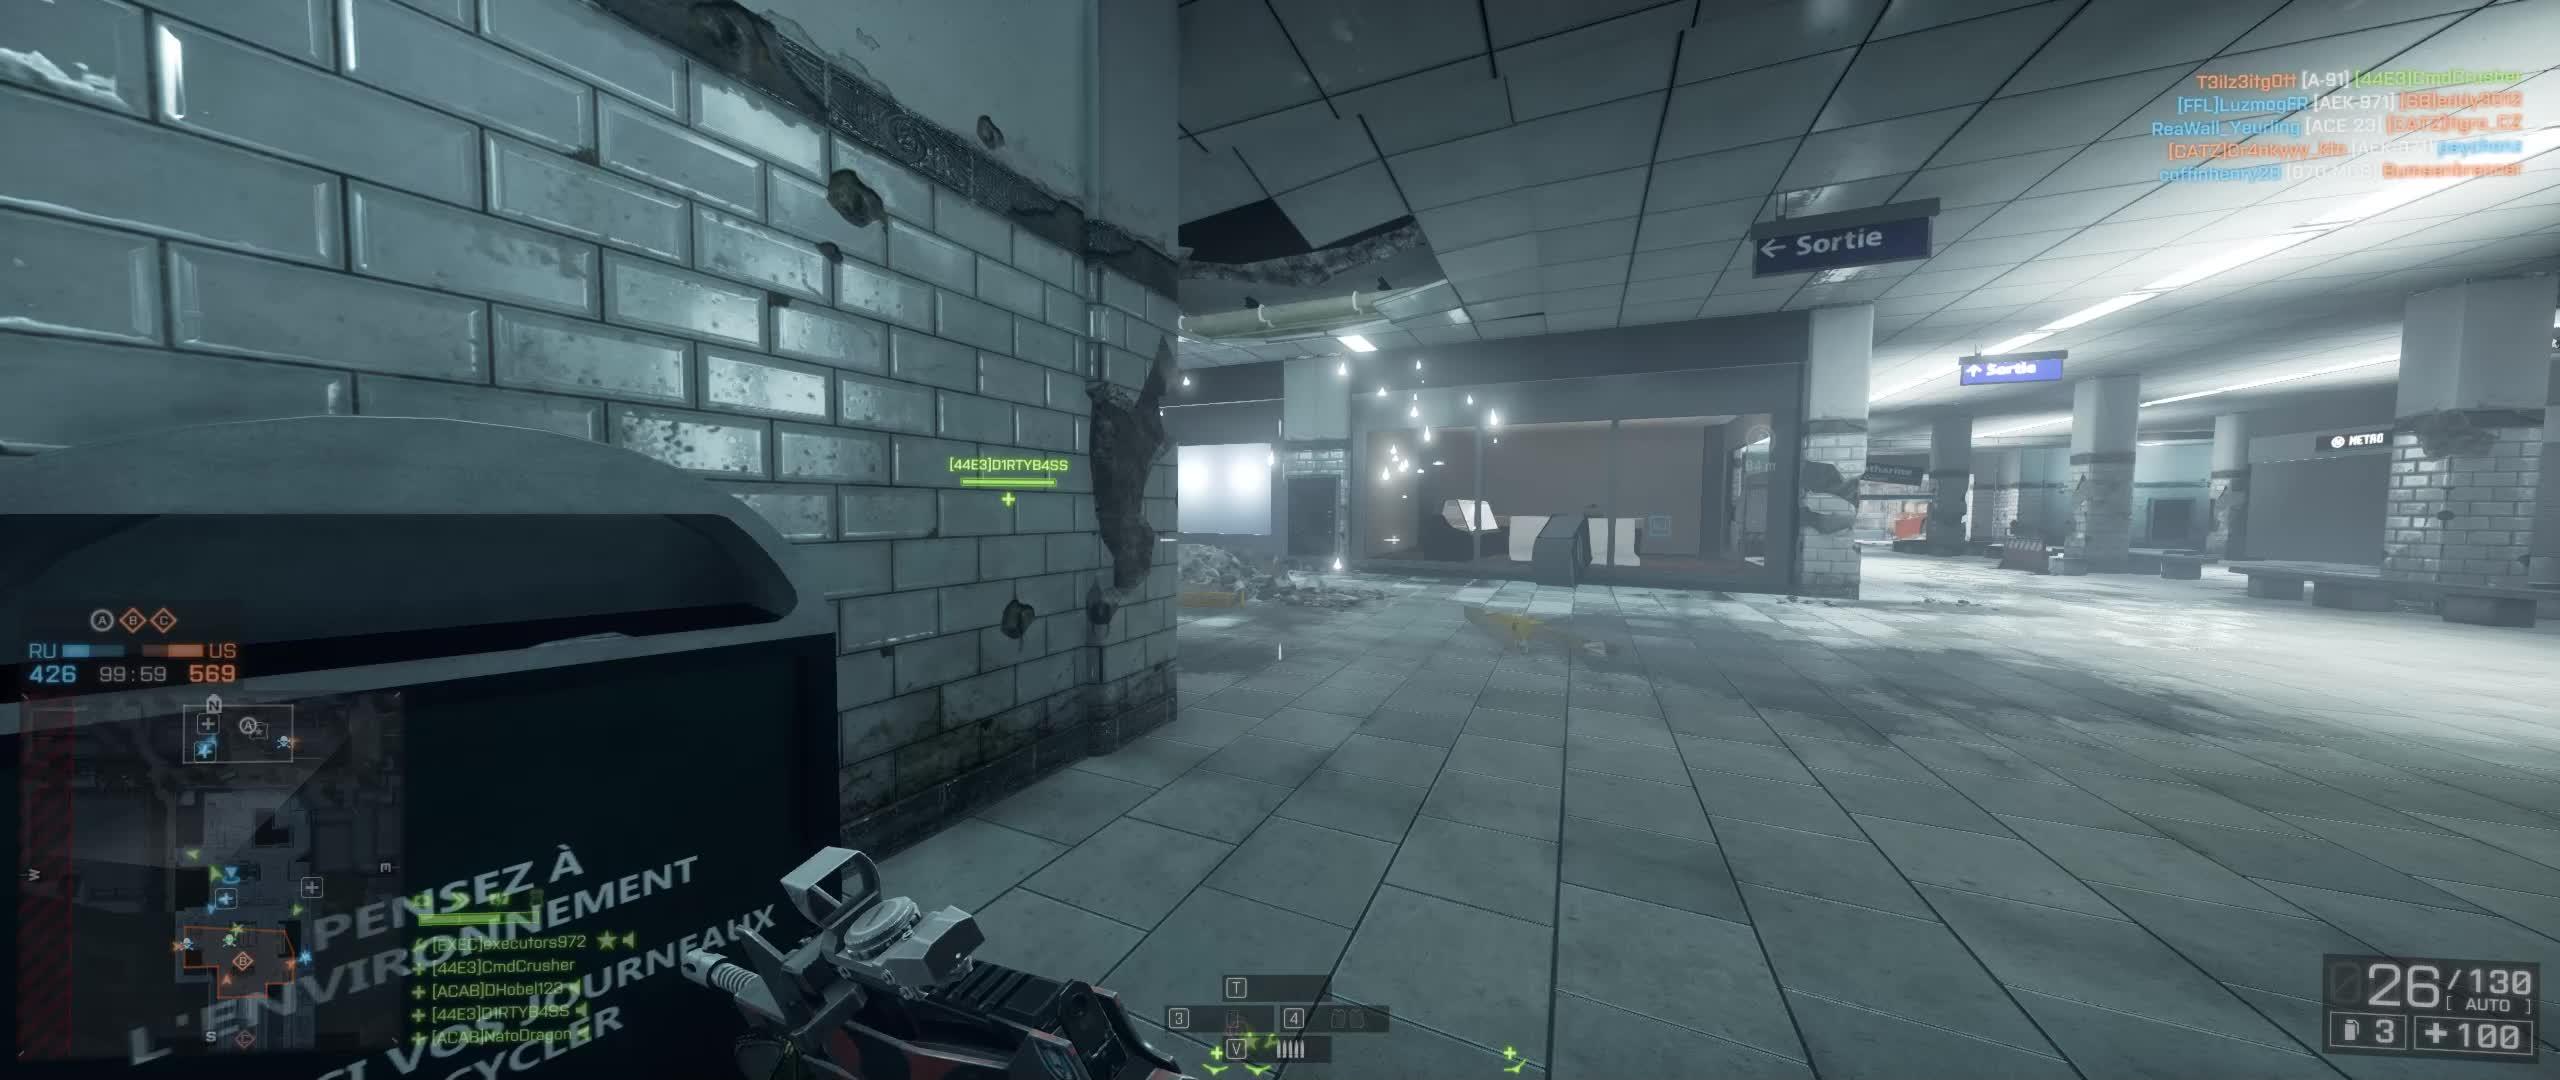 Battlefield 4 - R.I.P Tigro GIFs